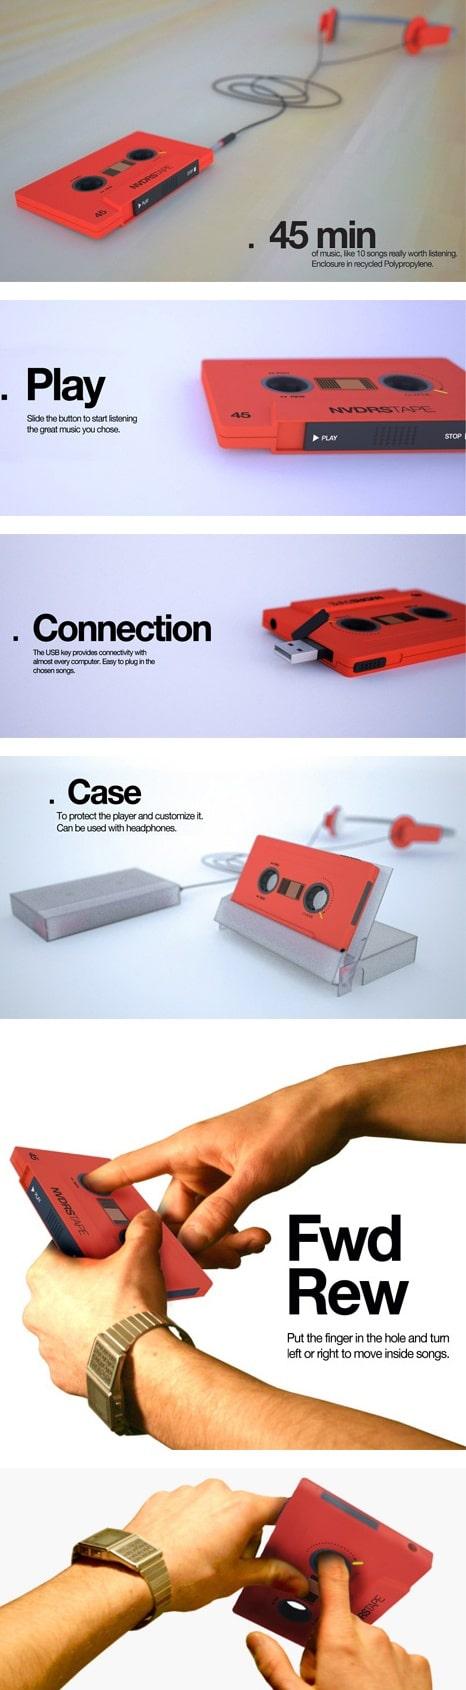 Retrofied Cassette MP3 Player Design